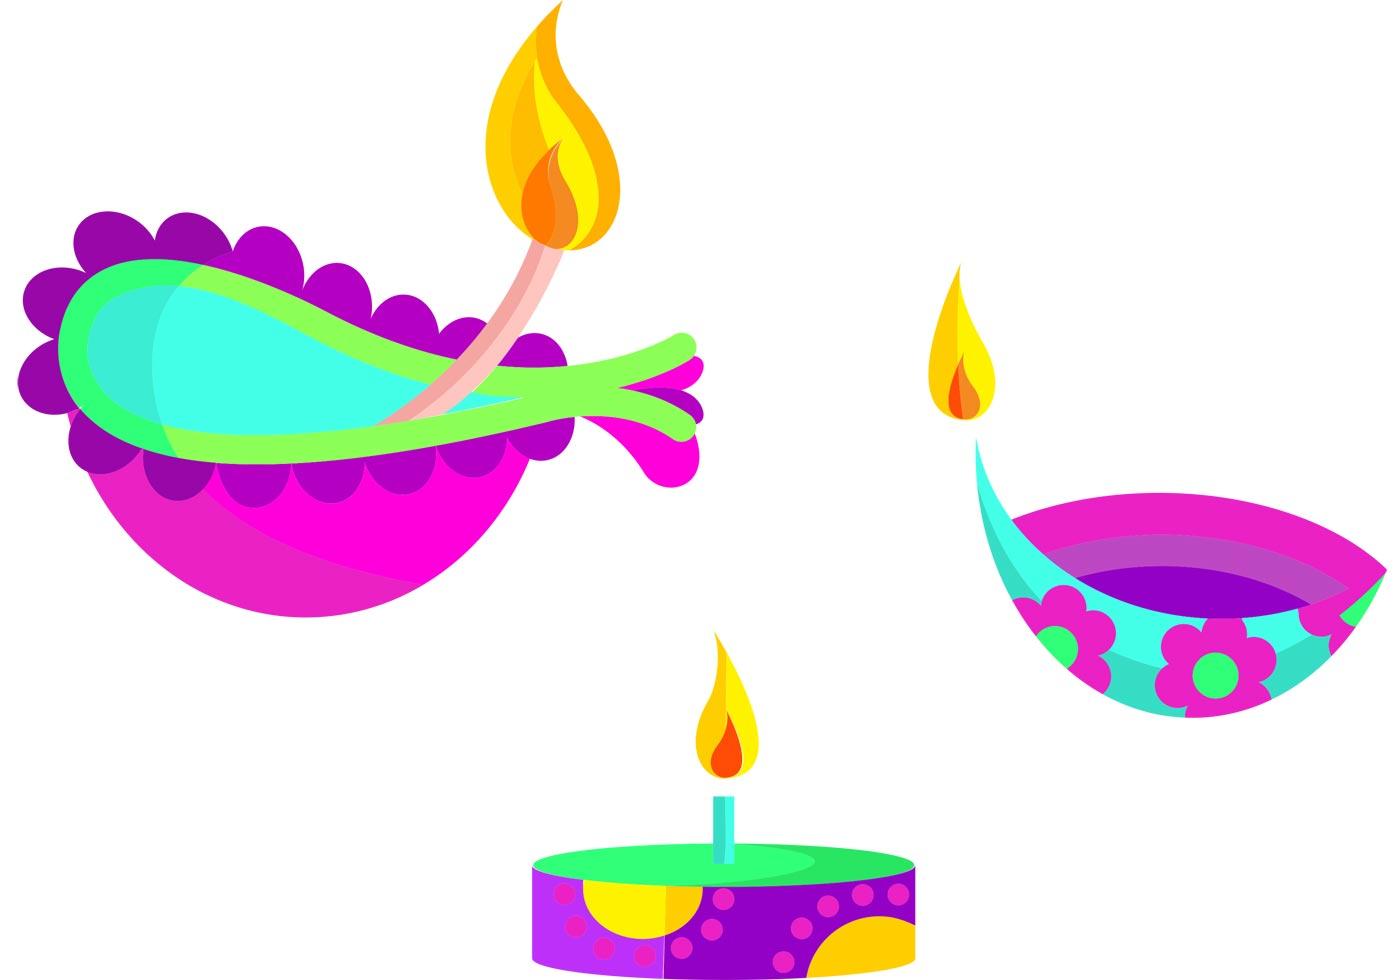 Diwali diya - oil lamp for dipawali celebration - vector illustration